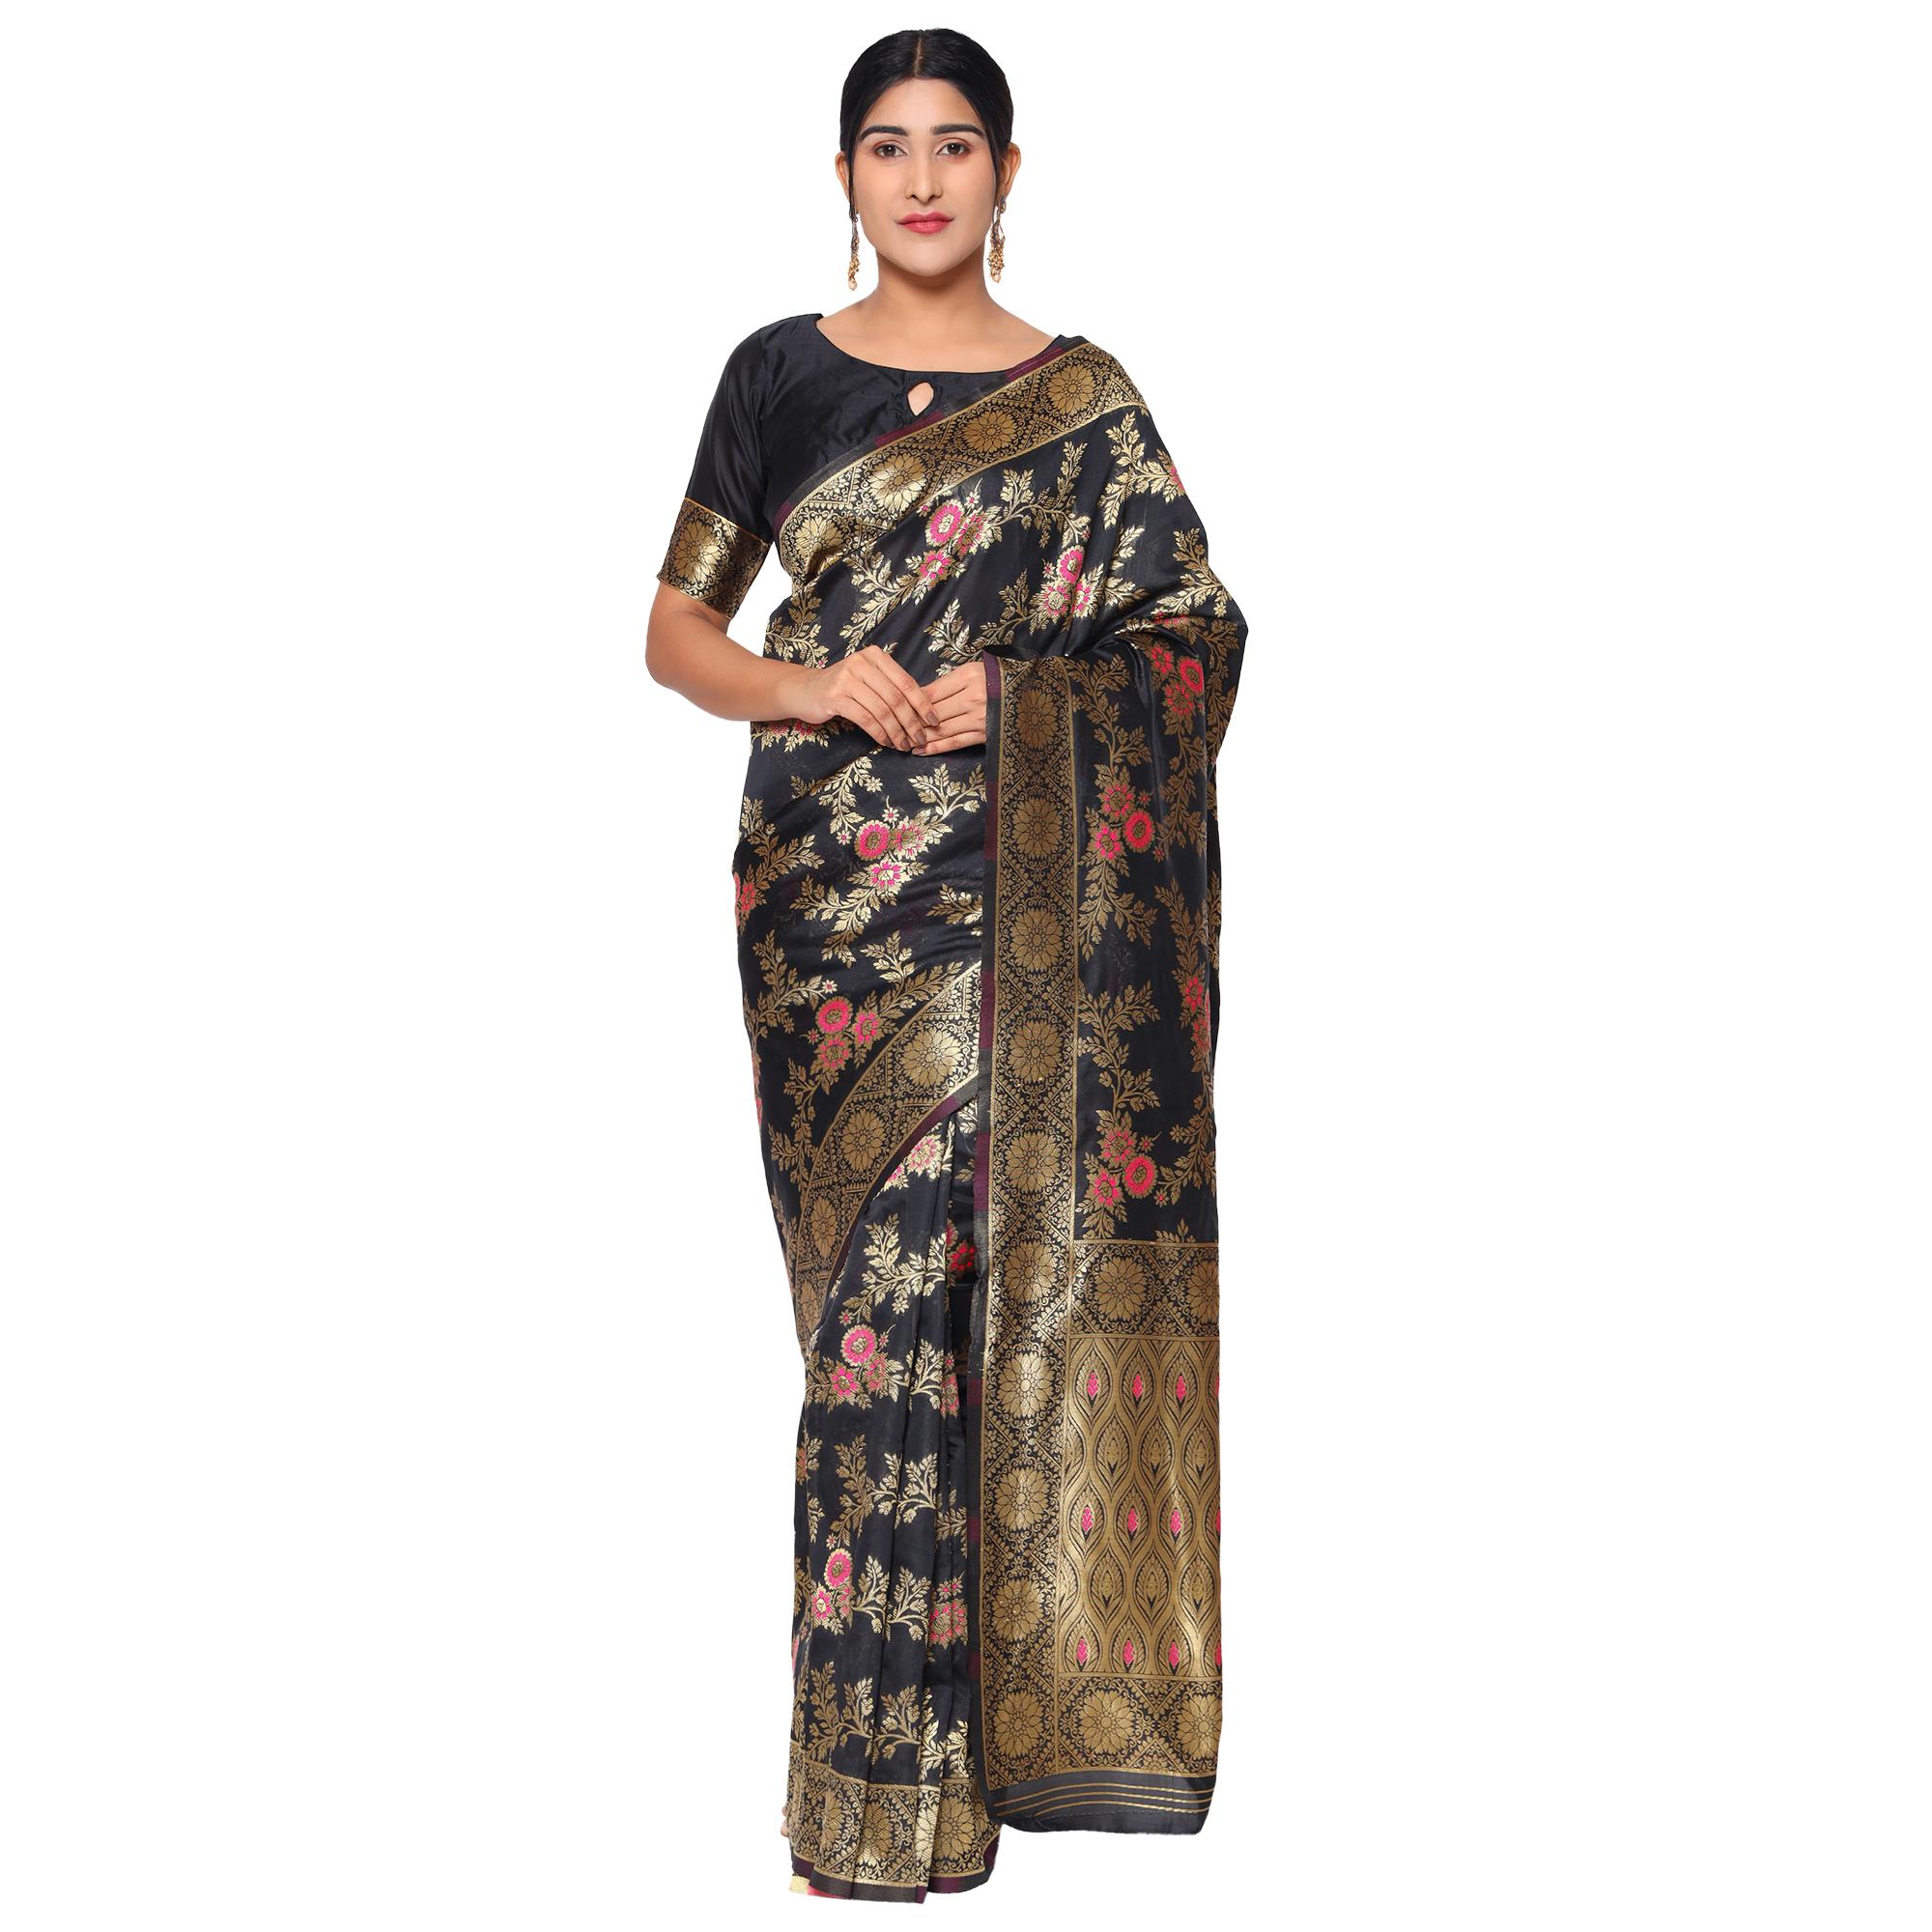 Glemora | Glemora Black Designer Ethnic Wear Silk Blend Banarasi Traditional Saree